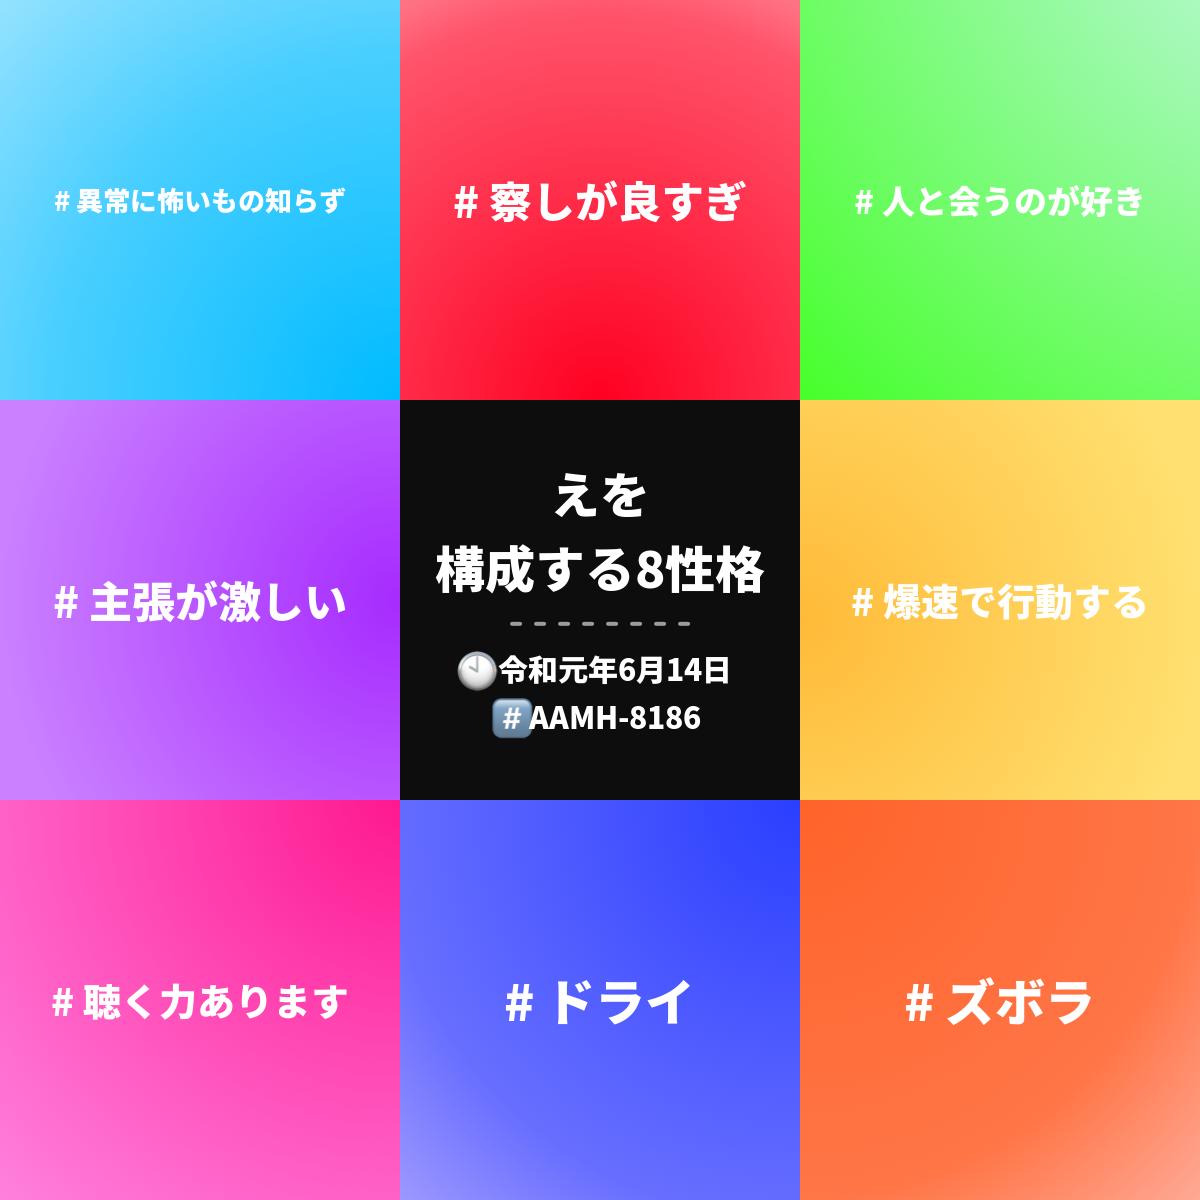 f:id:nagasaki-harikyusekkotsuin:20190724143158p:plain